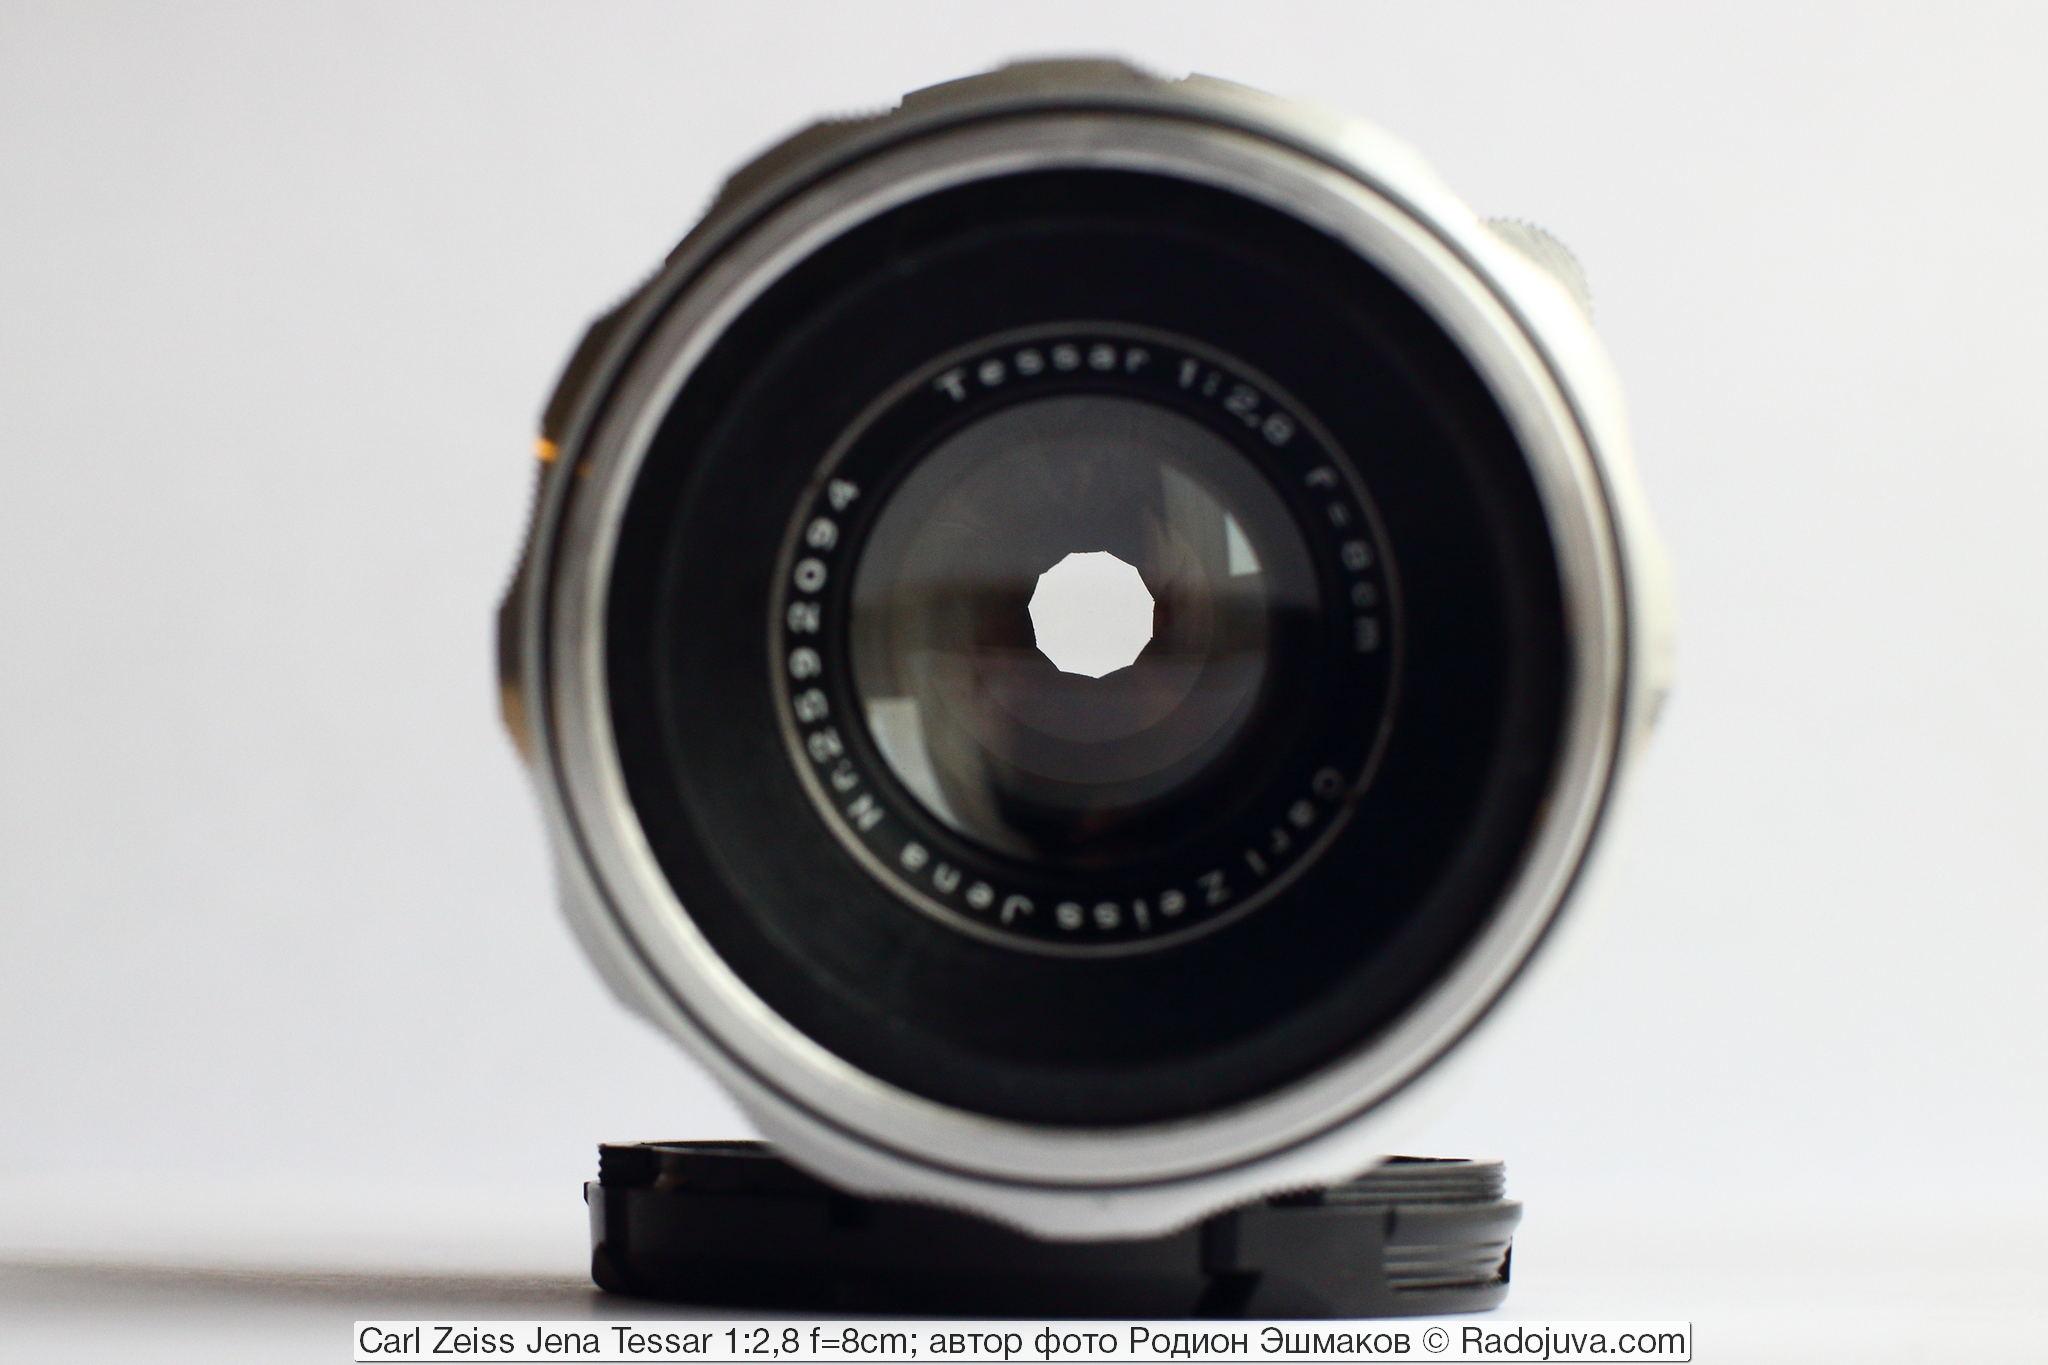 Вид объектива на просвет с прикрытой диафрагмой.